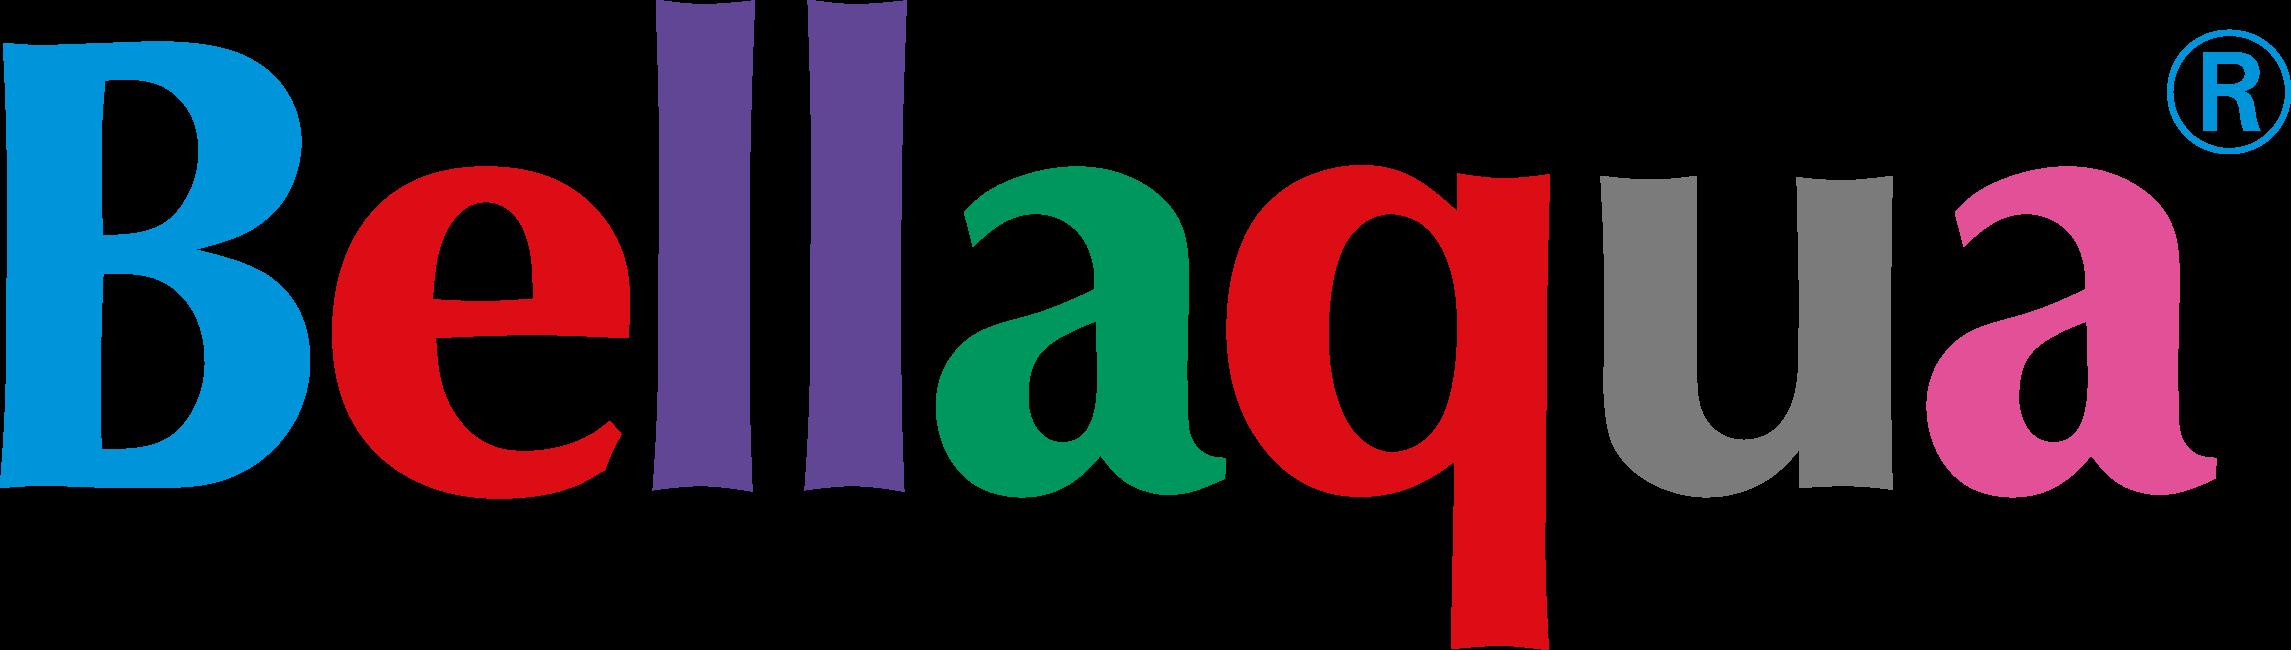 Bellaqua